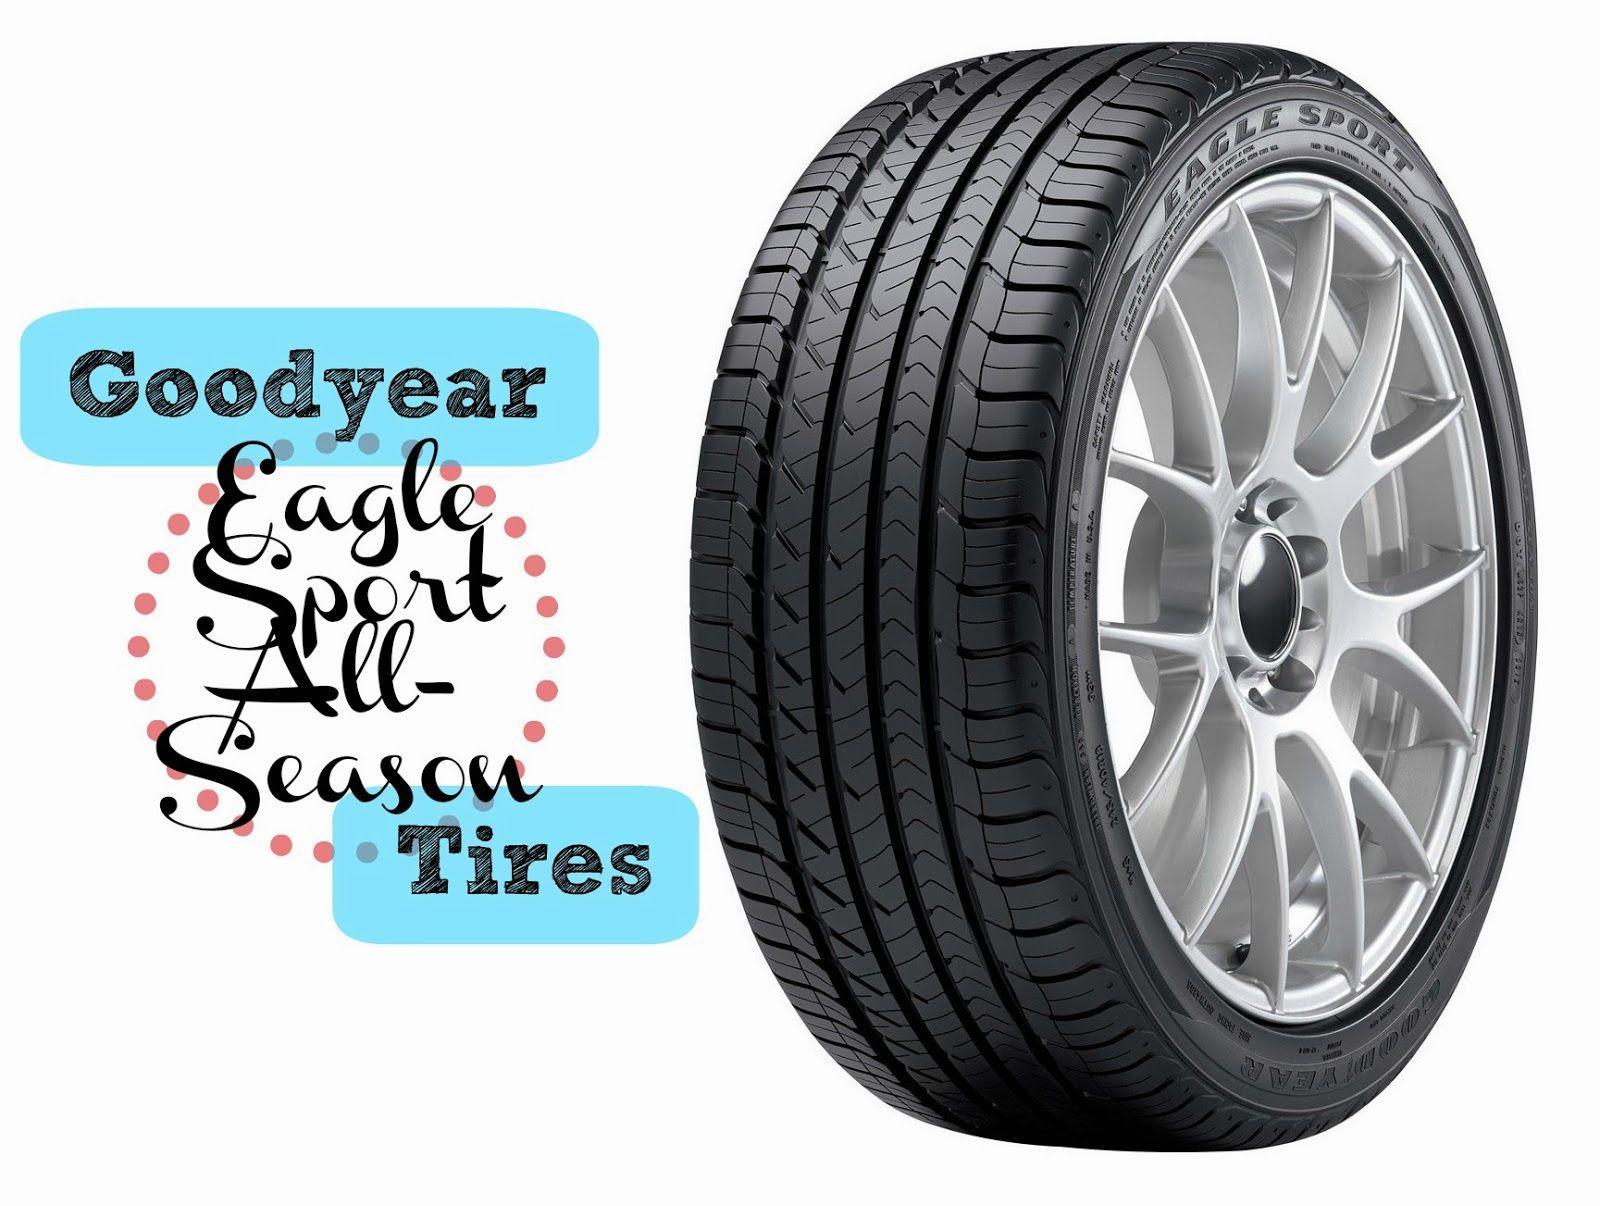 Goodyear Eagle Sport AllSeason Tires